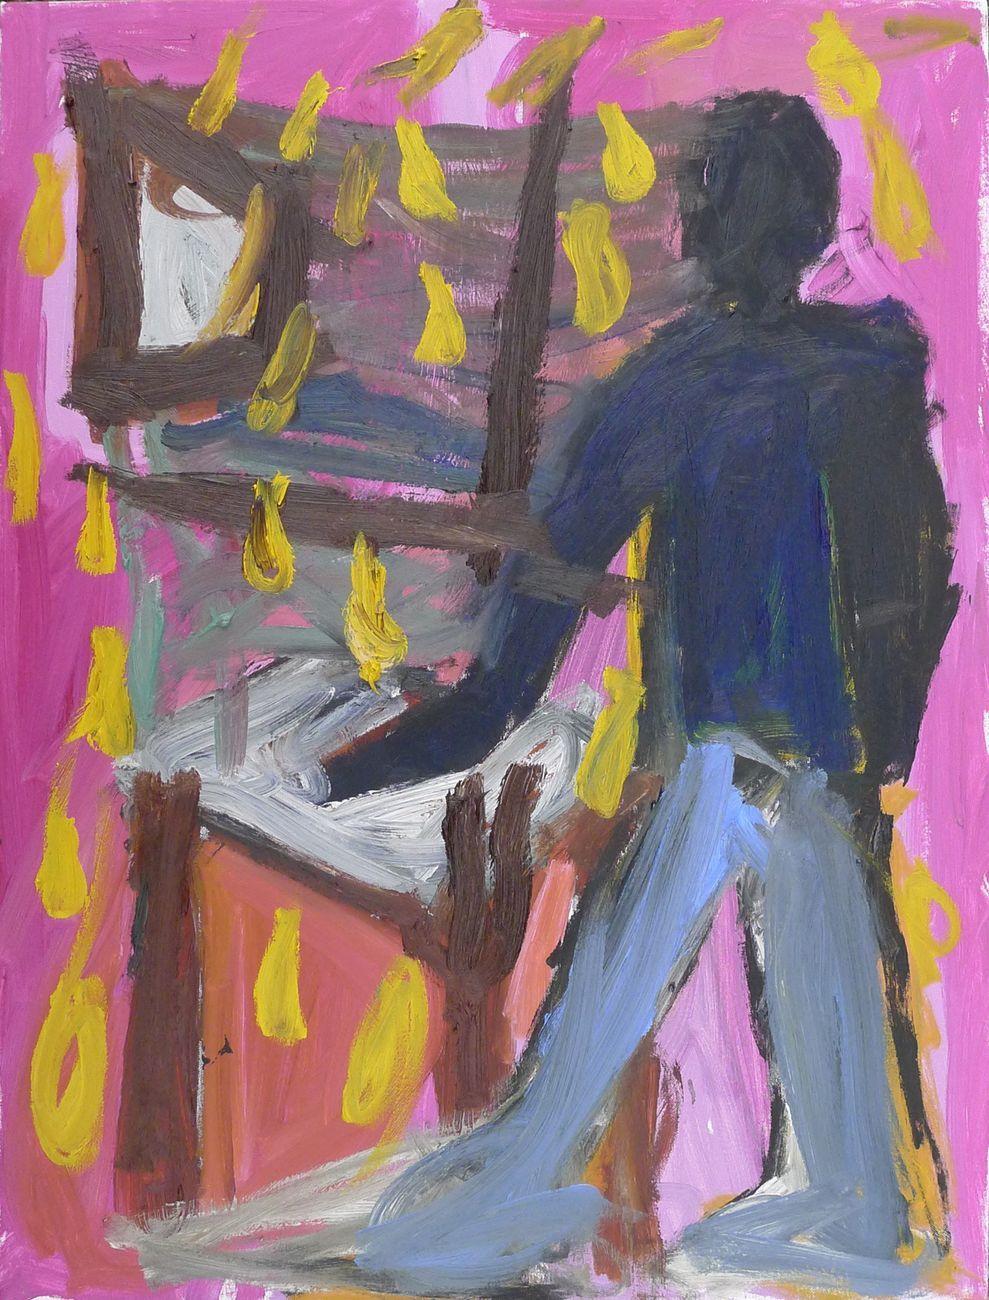 Matteo Cordero, Pink Room, 2019, olio su tela, 80x60 cm